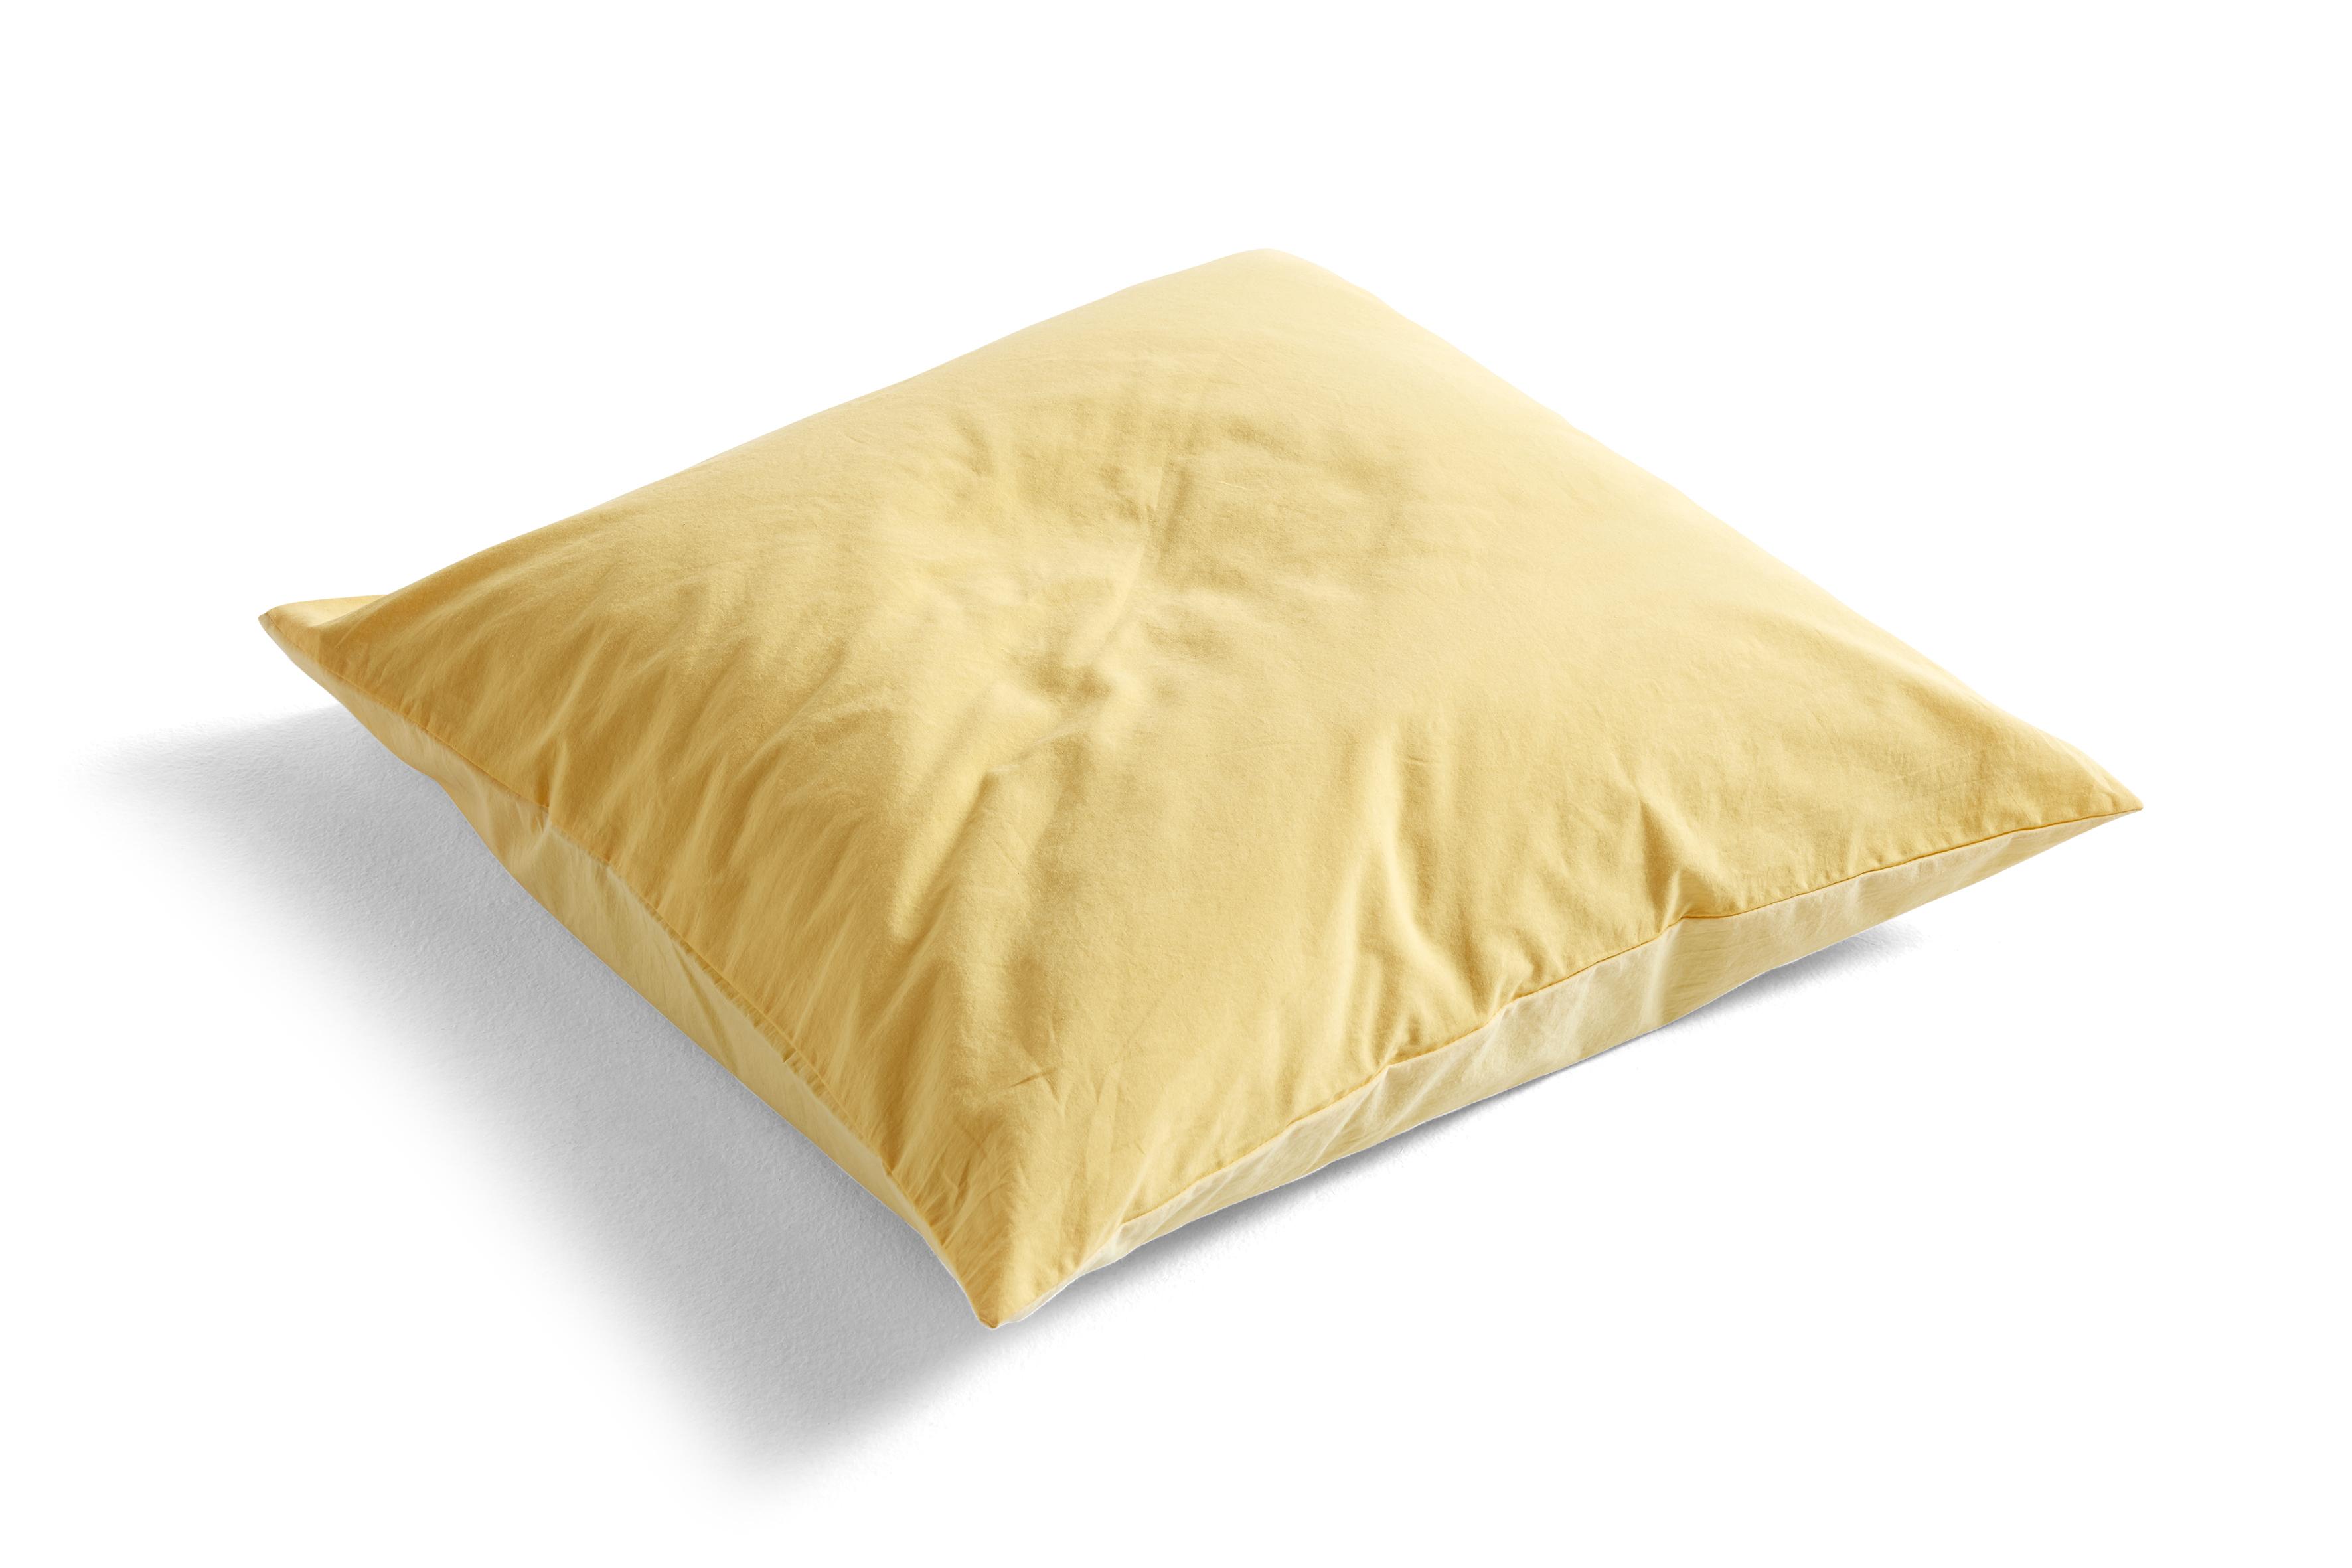 HAY - Duo Pillow Cover 63 x 60 cm - Golden Yellow (540847)